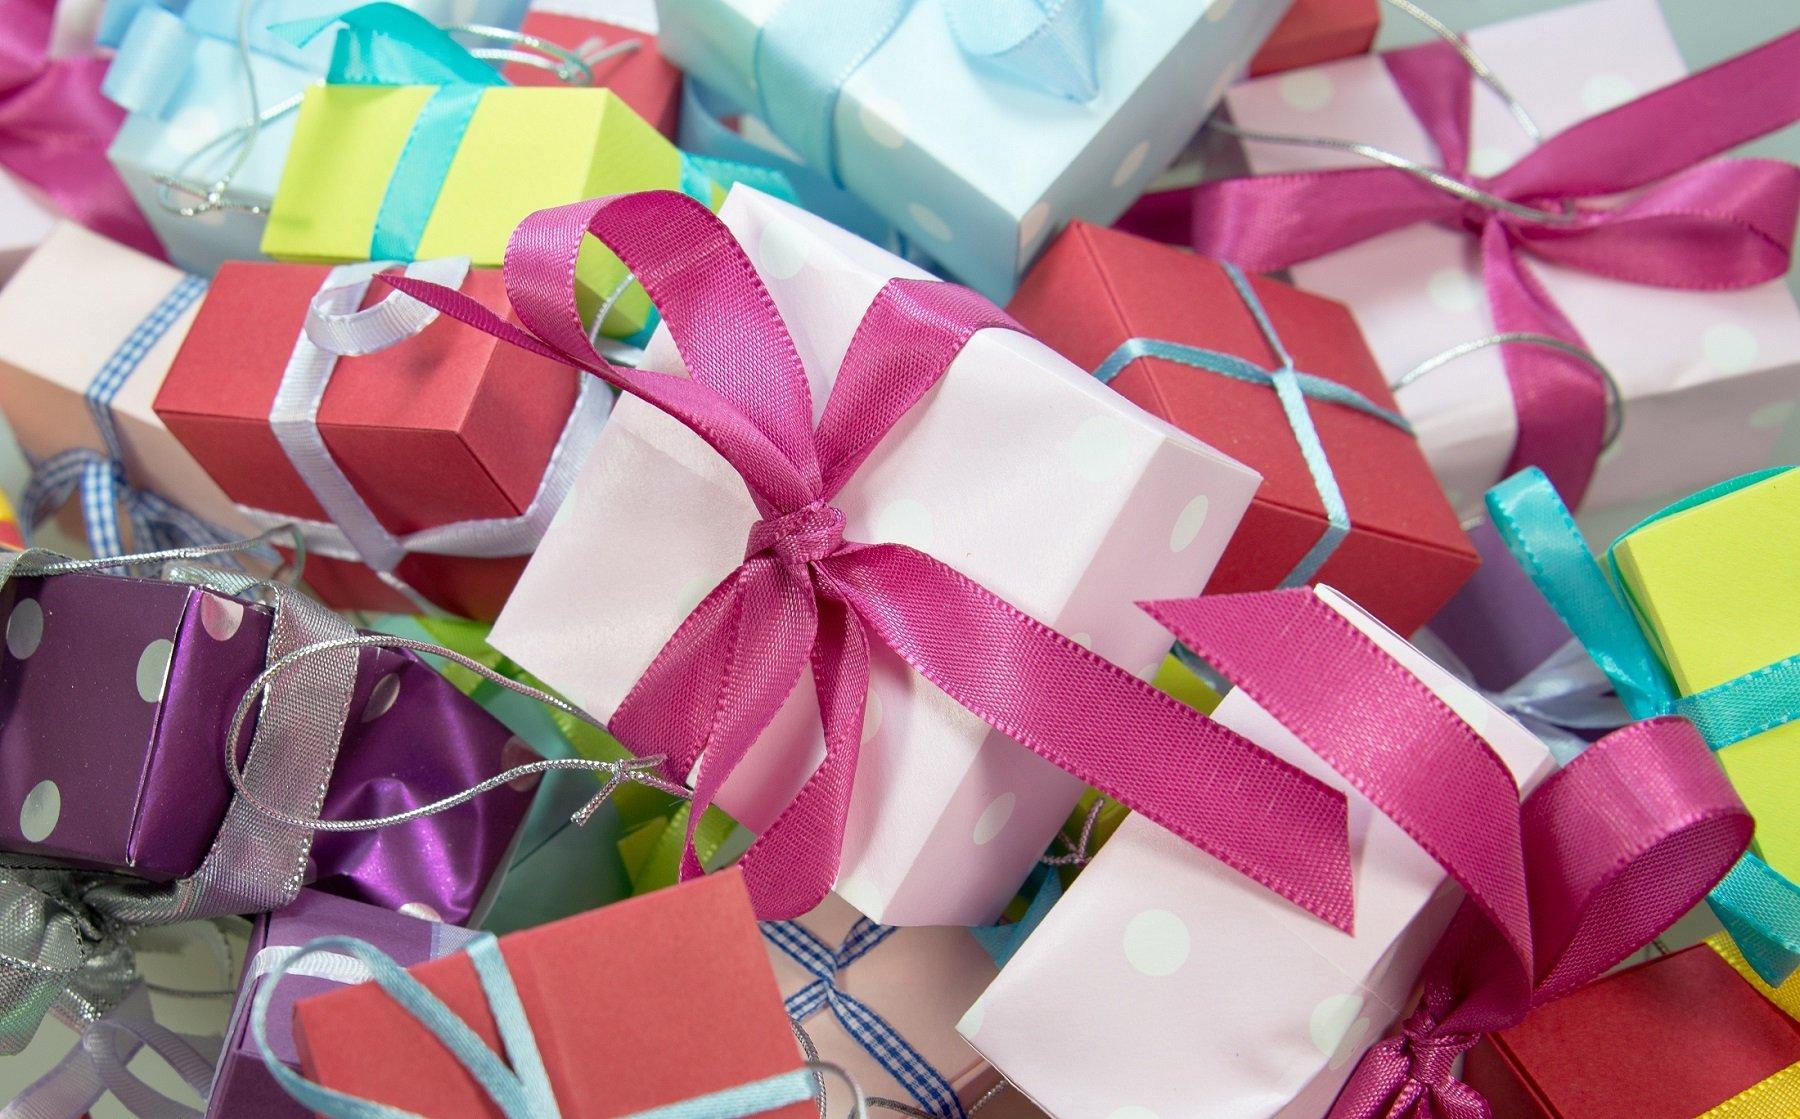 25 Best Gift Ideas for Boyfriends